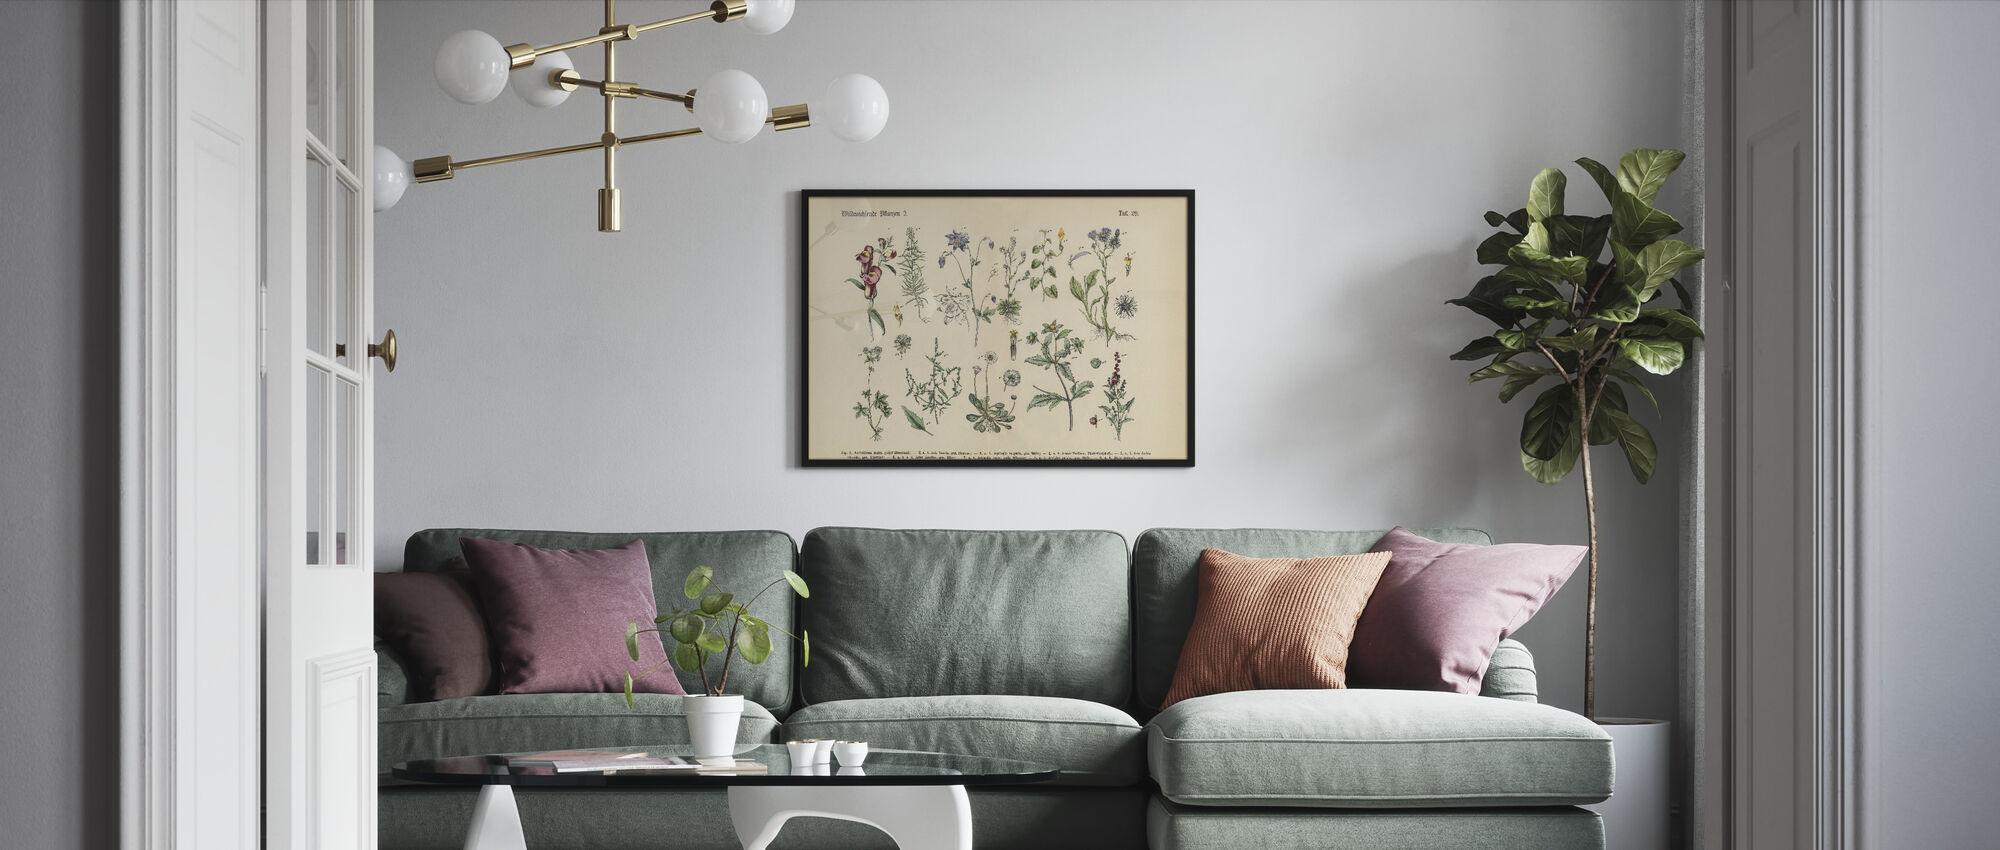 Wildflower and Medicinal Herbal Plants - Framed print - Living Room